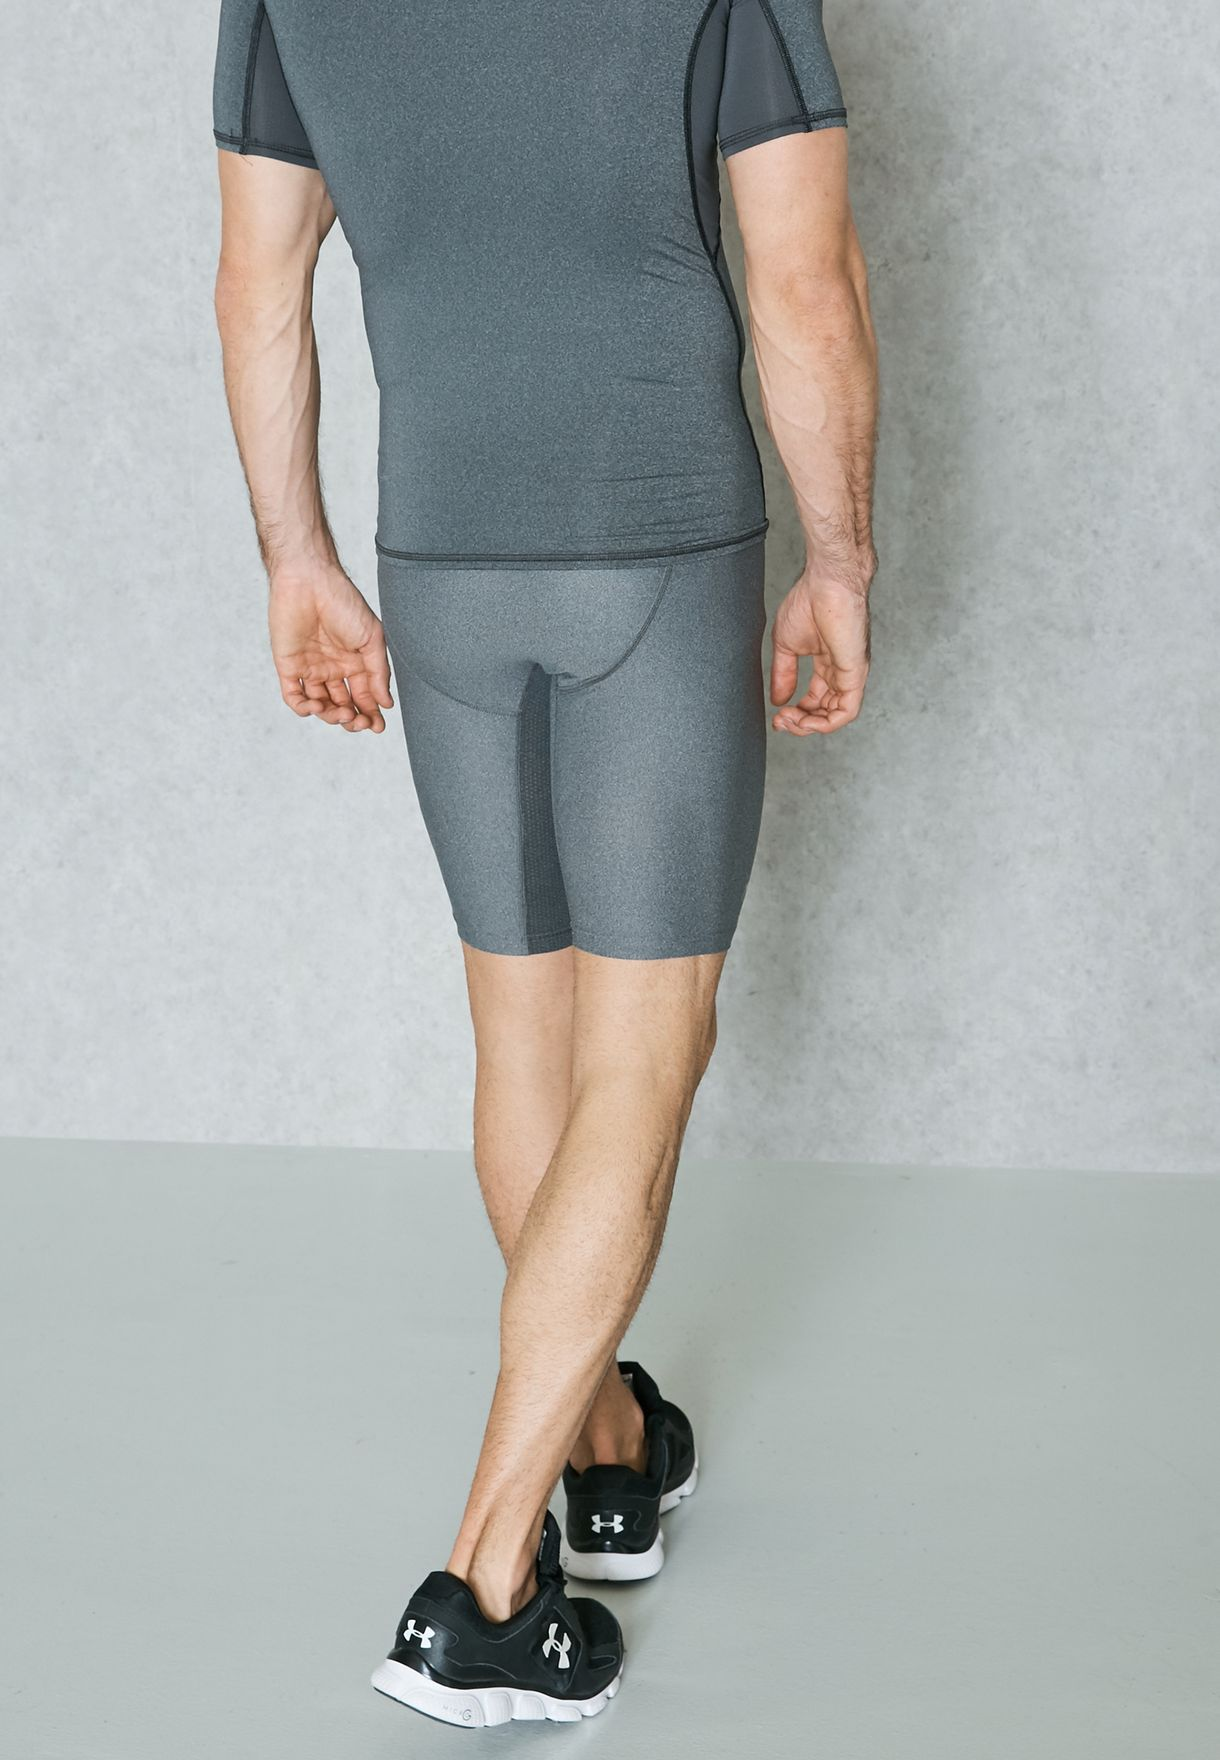 HeatGear 2.0 Long Shorts